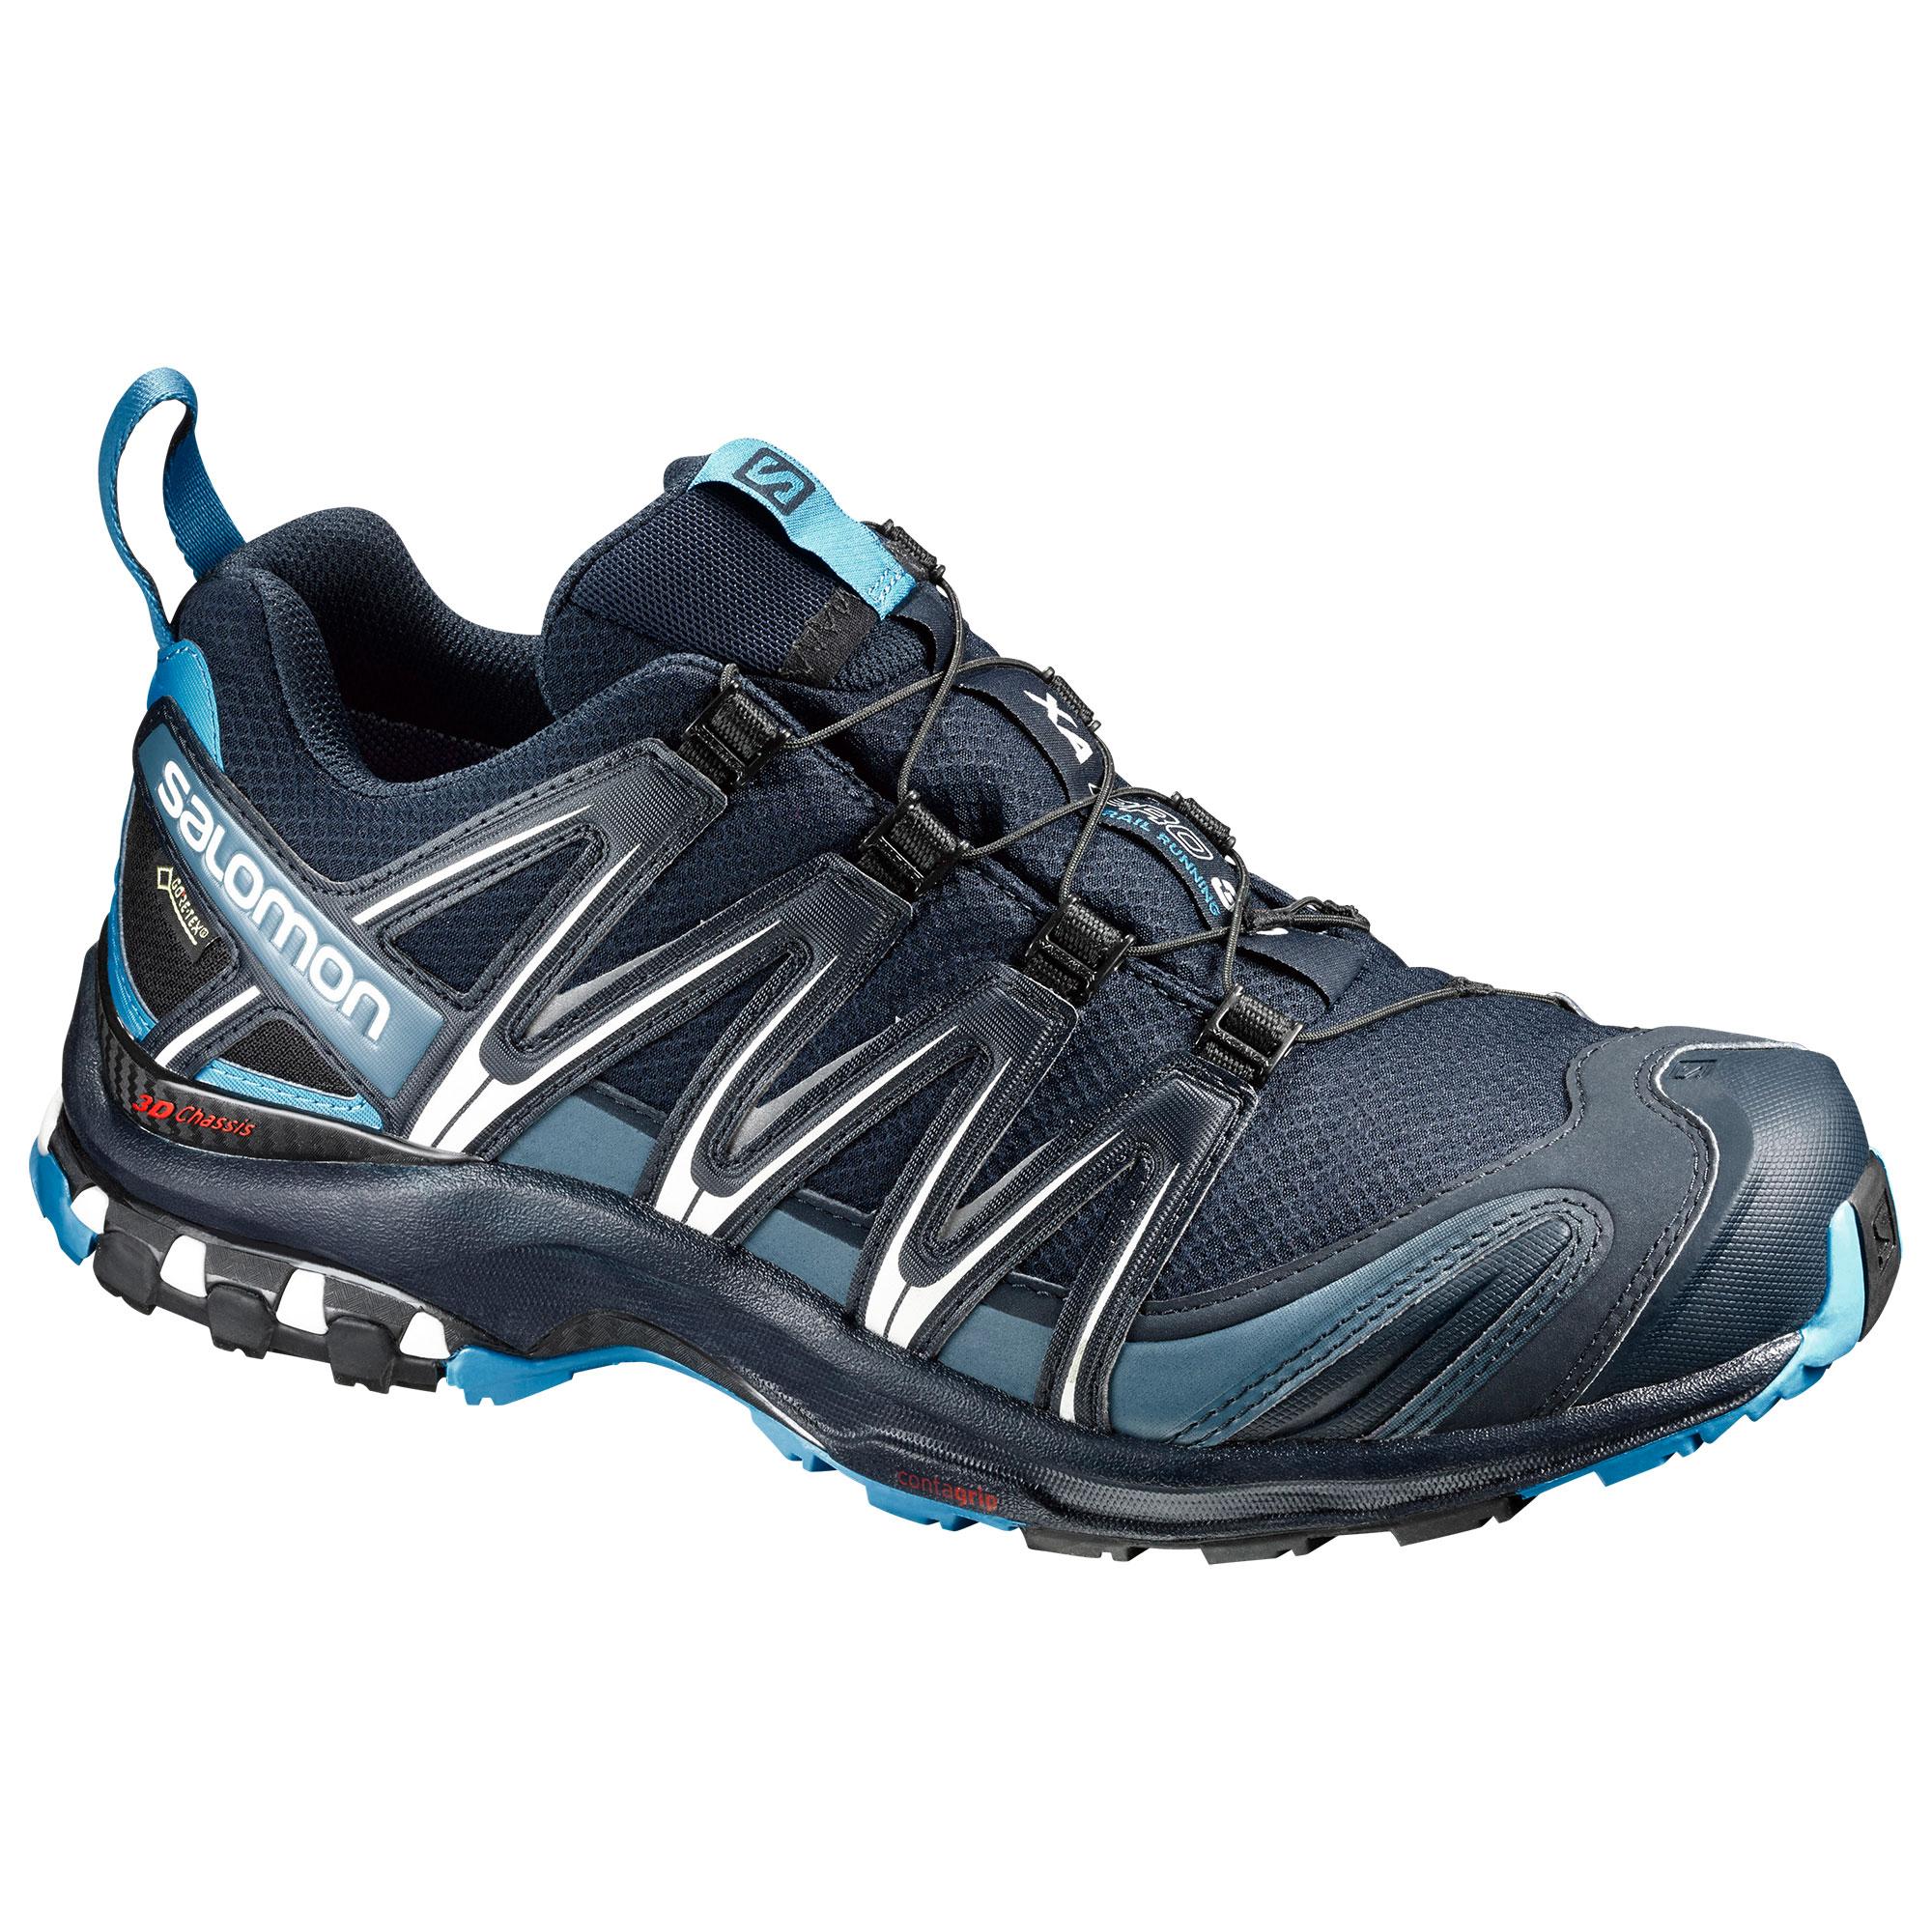 92265ba574bf Salomon XA Pro 3D GTX USA All-Weather Hiking Shoe w  Free Shipping — 23  models